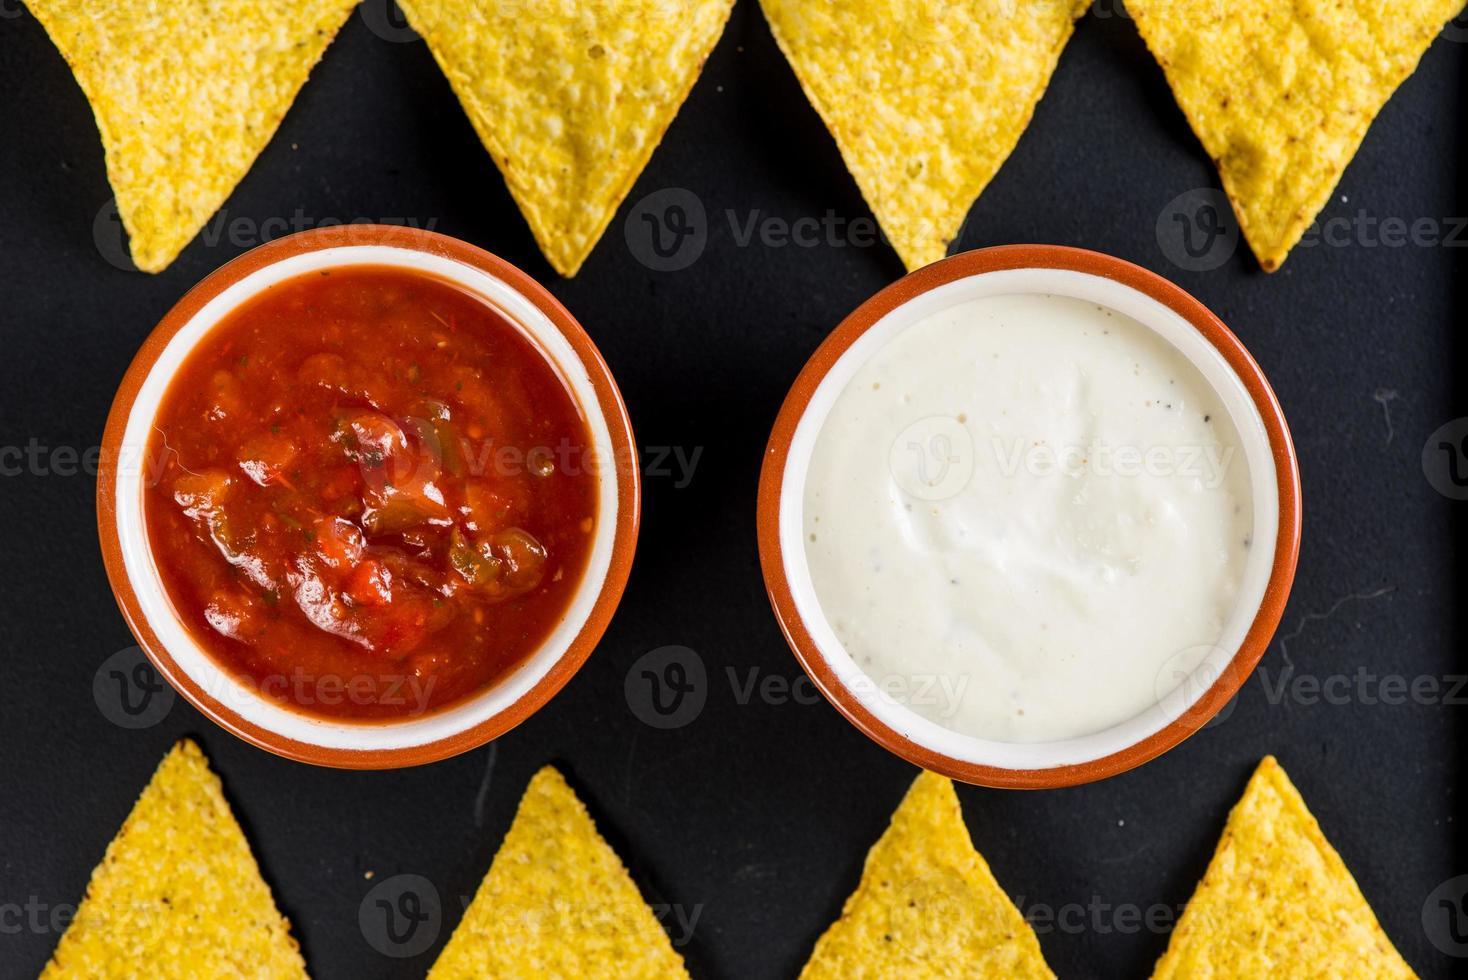 nachos mexicains de street food avec salsa photo